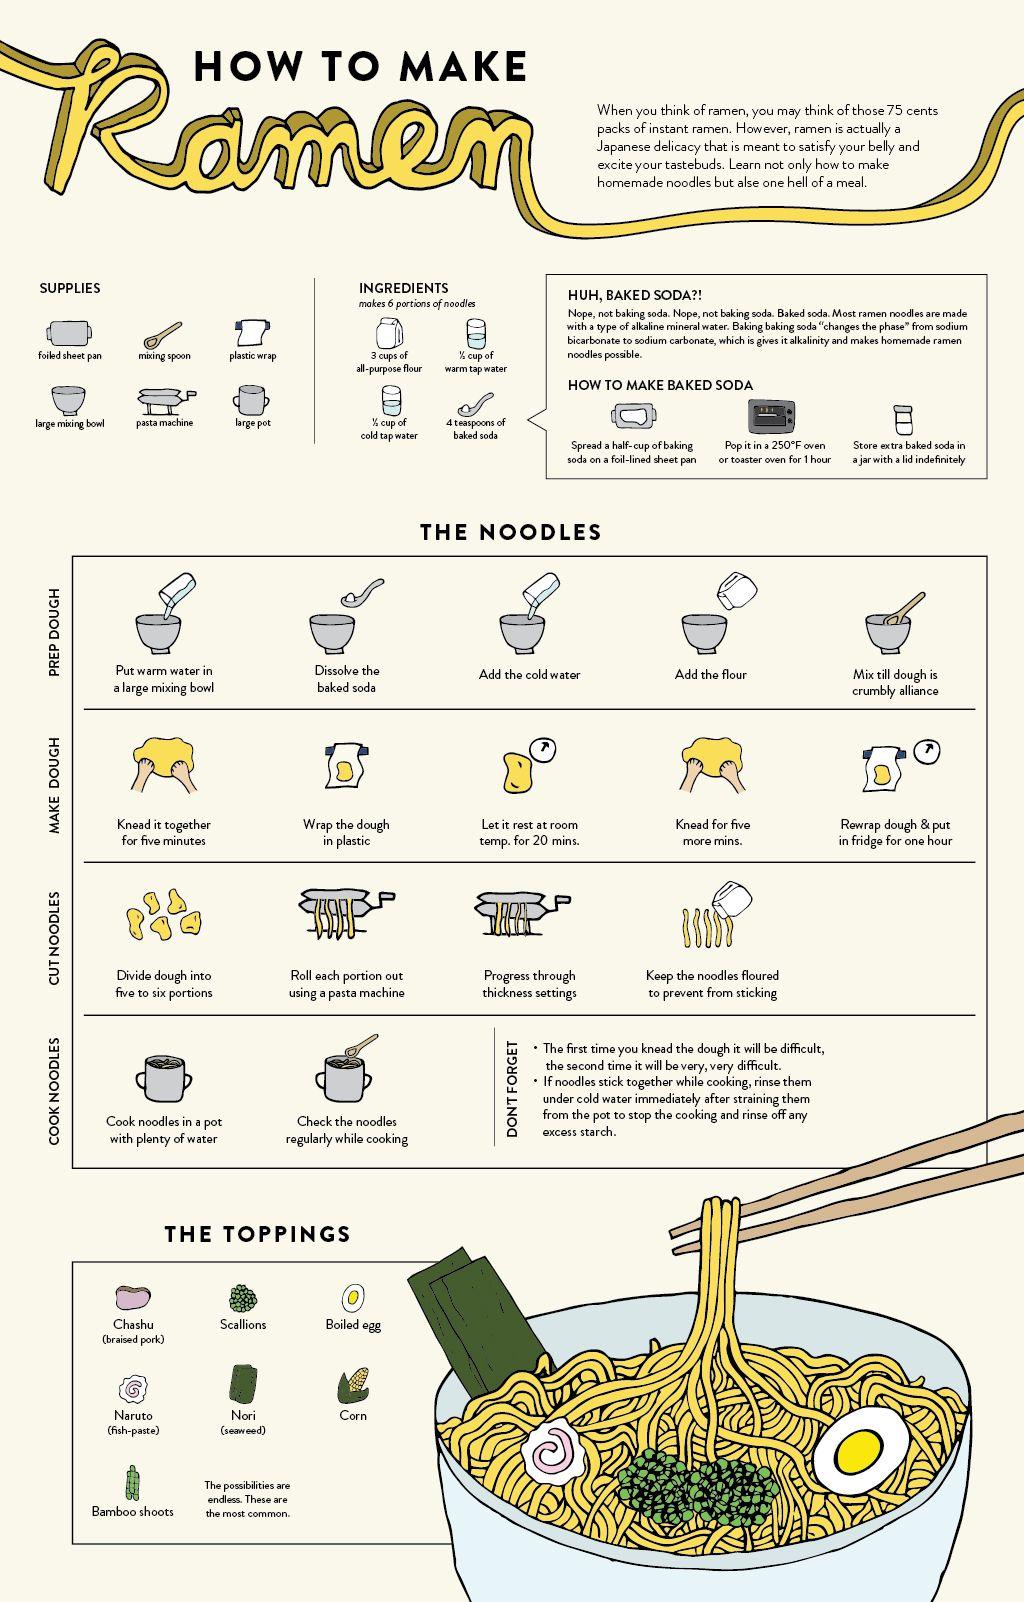 Blue apron alternatives reddit - The 25 Best Ideas About Fresh Ramen Noodles On Pinterest Ramen Noodle Flavors Top Ramen Noodles And Ramen Noodles Ingredients